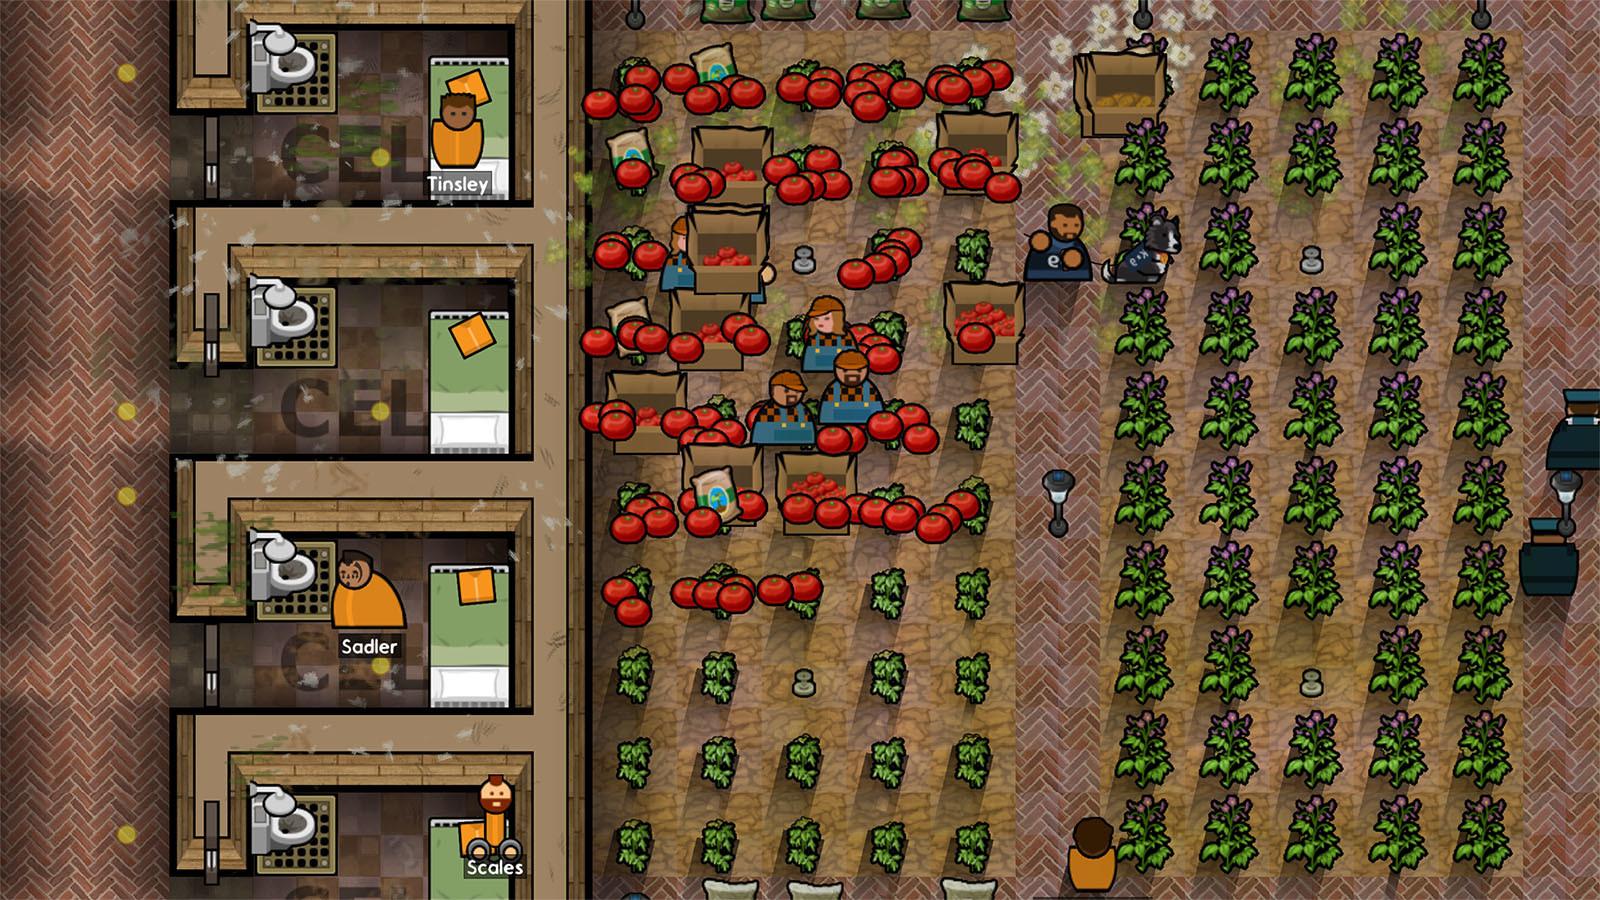 Prison Architect - Going Green | CN_LATAM_TR (ce5dac56-430b-4900-960a-588c93a0ad0d)